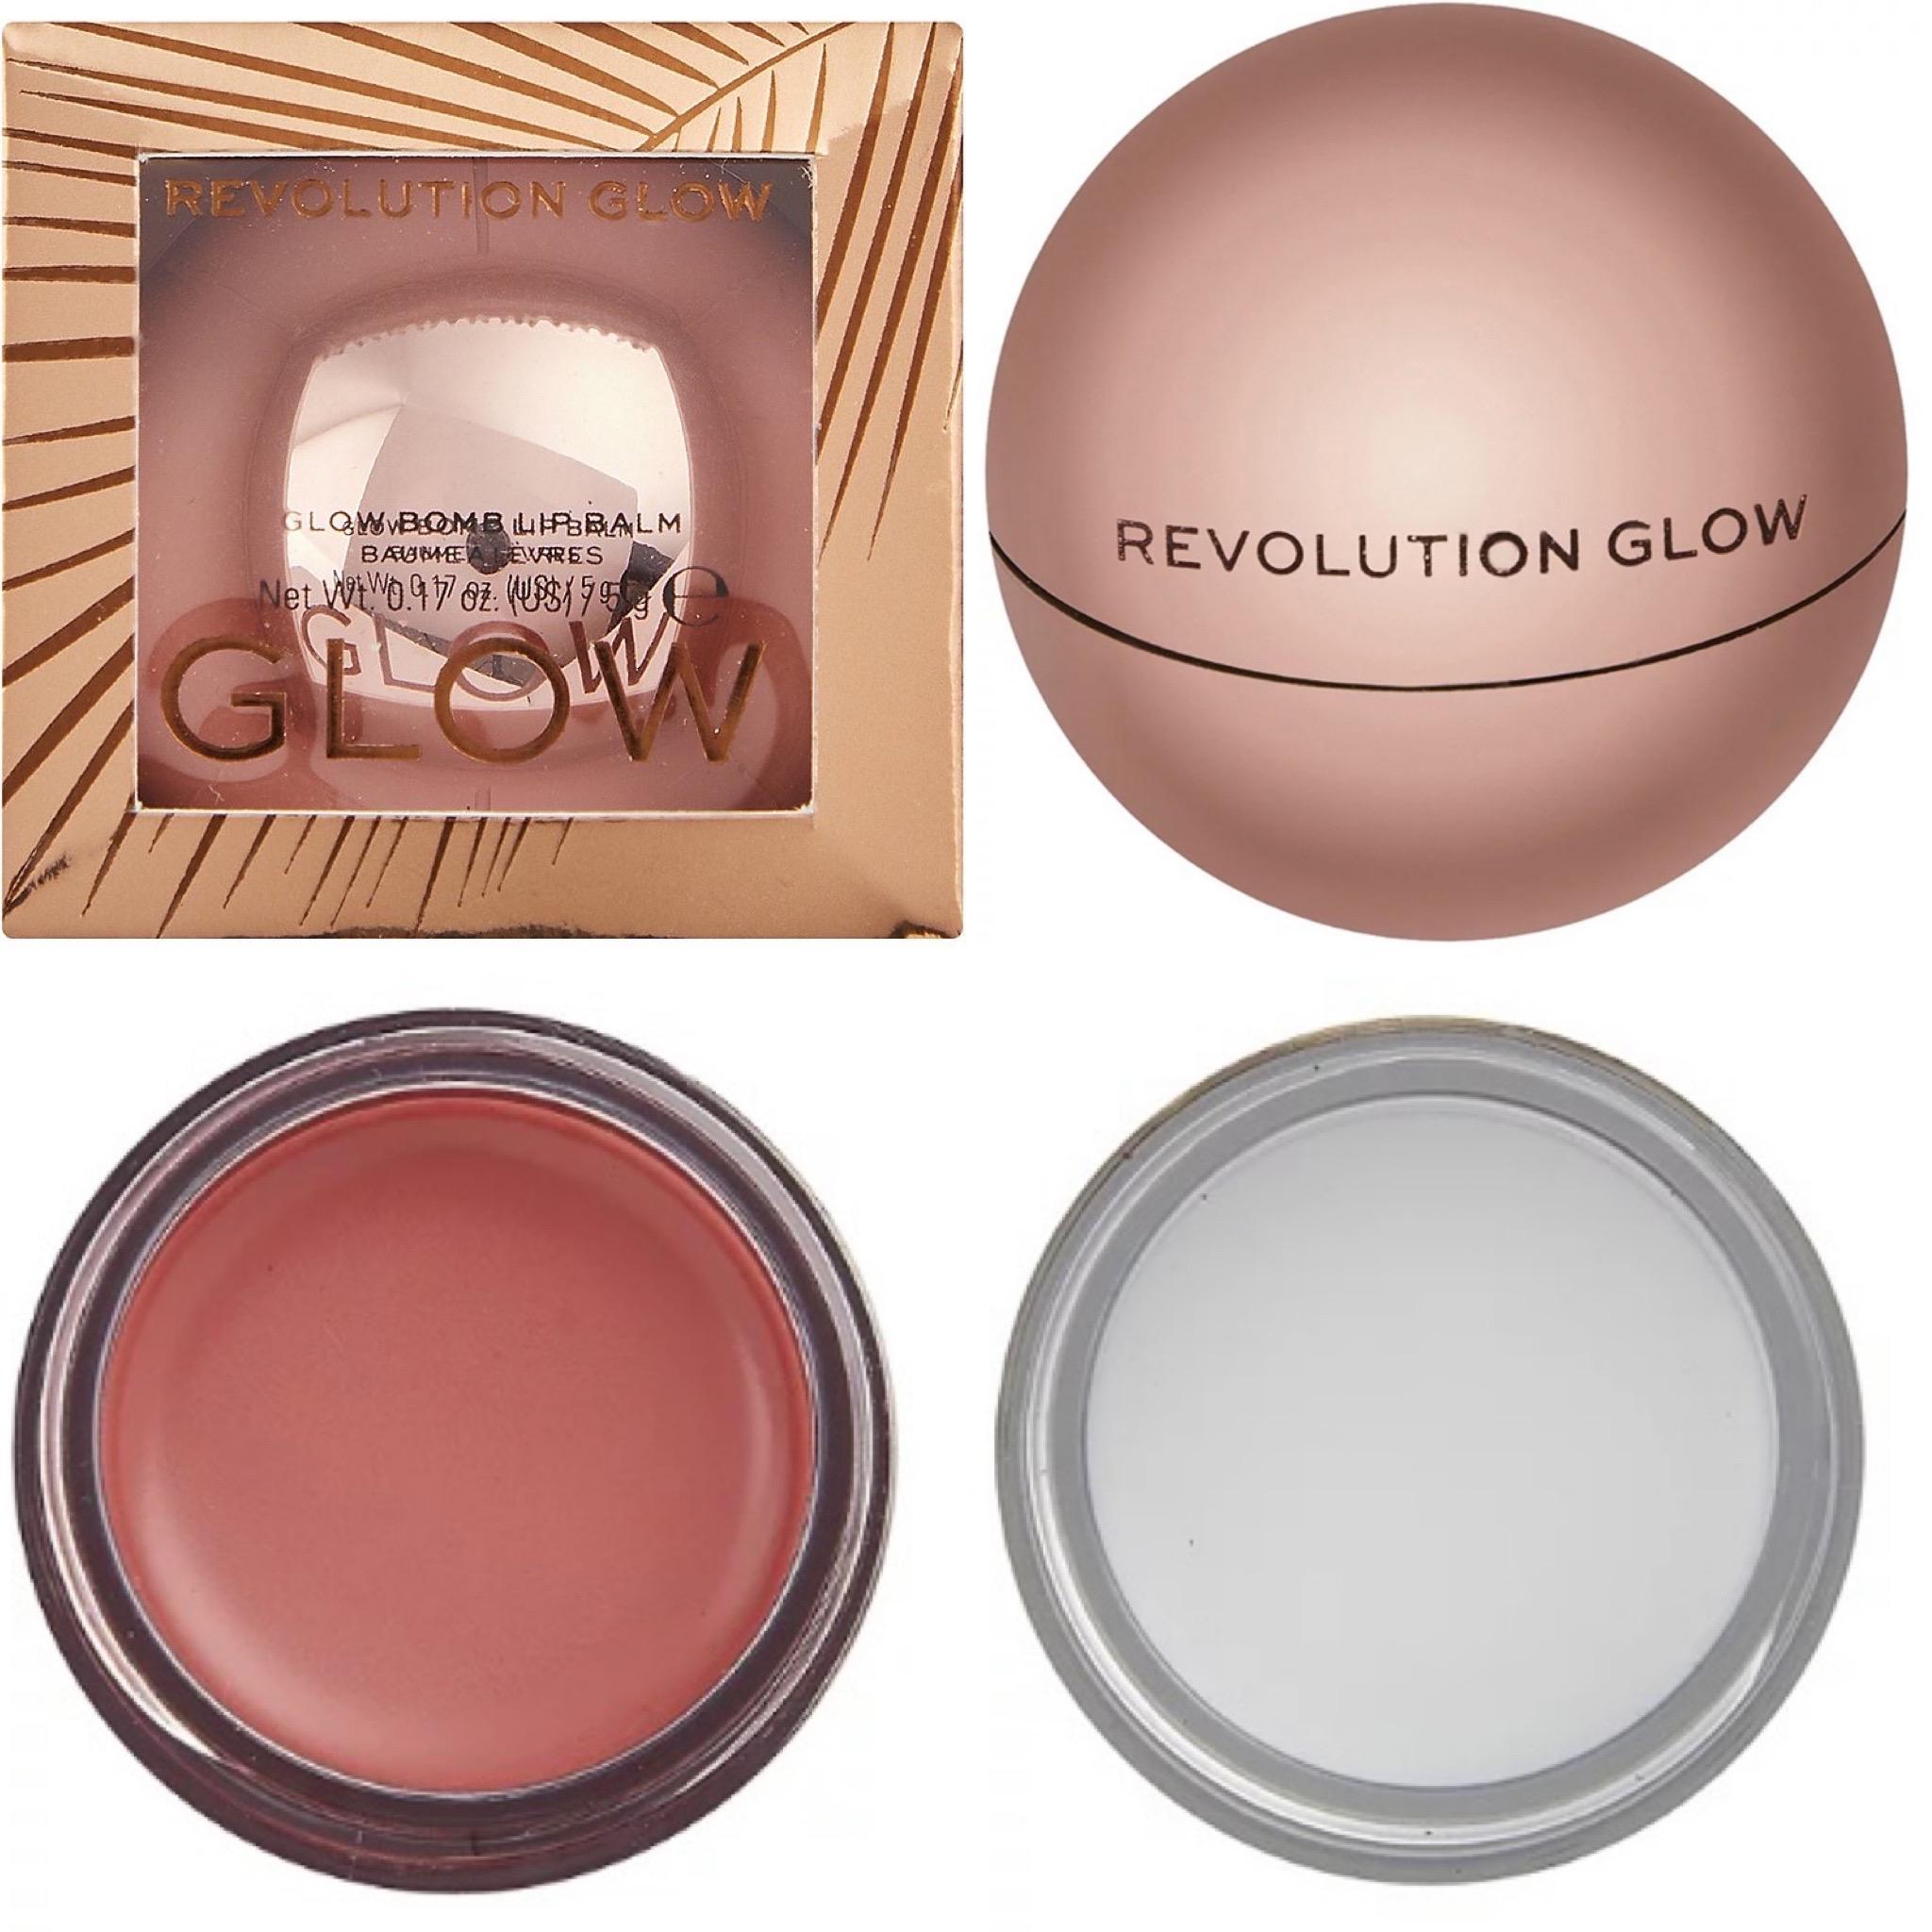 Revolution Glow Bomb Lip Balm